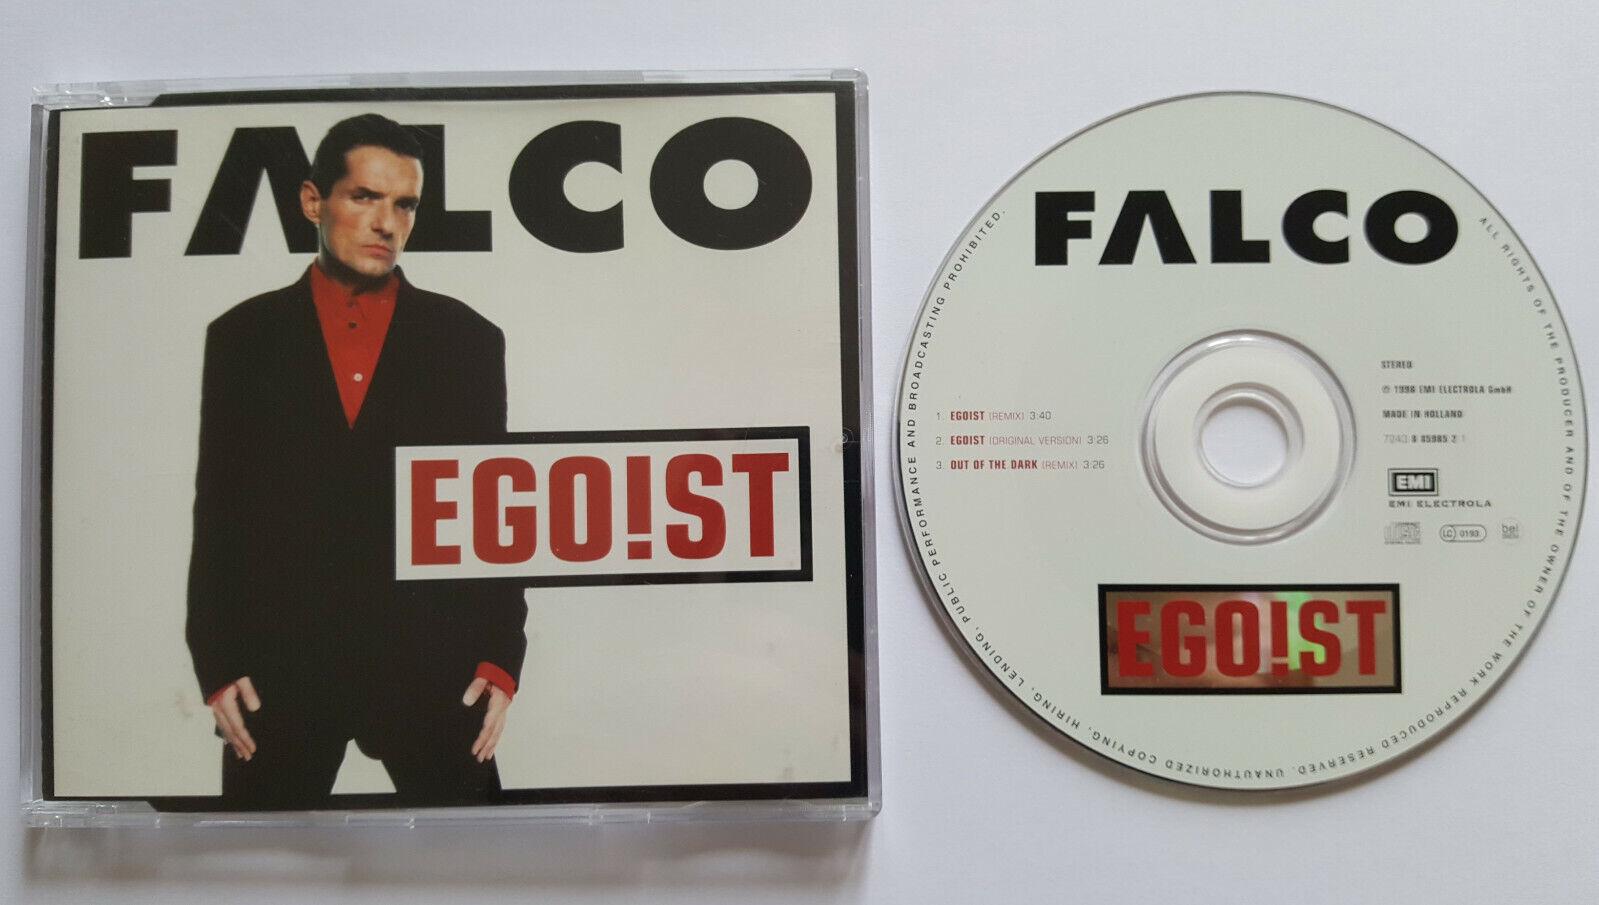 falco egoist text